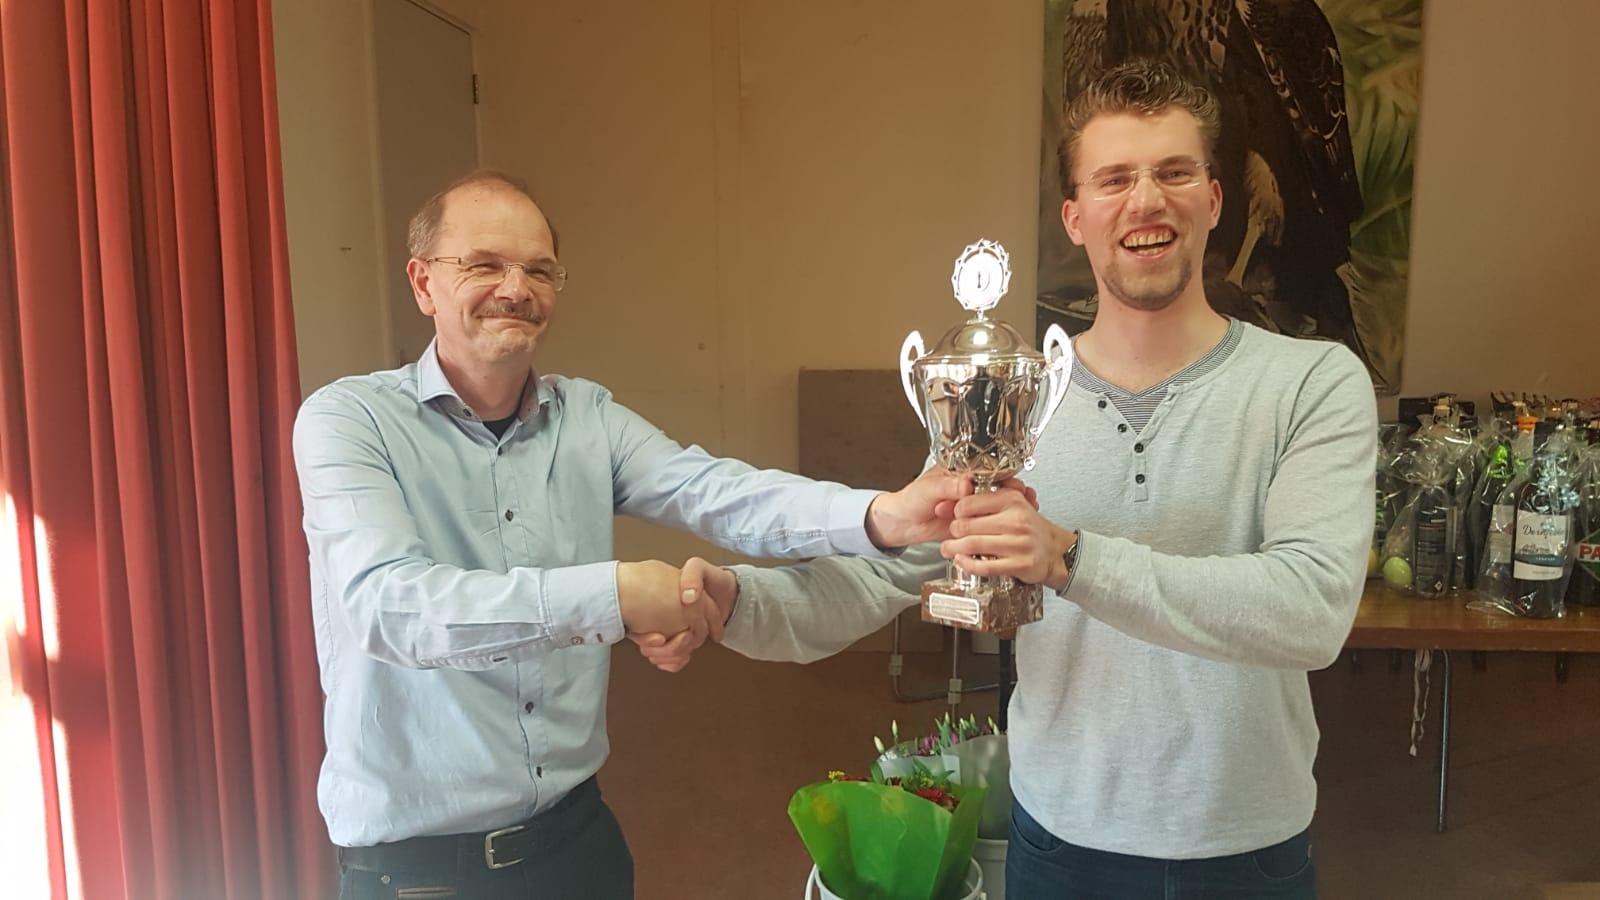 Alblasserwaardtoernooi 2018: Mark van Hulst (l) en winnaar Niels Mijnster